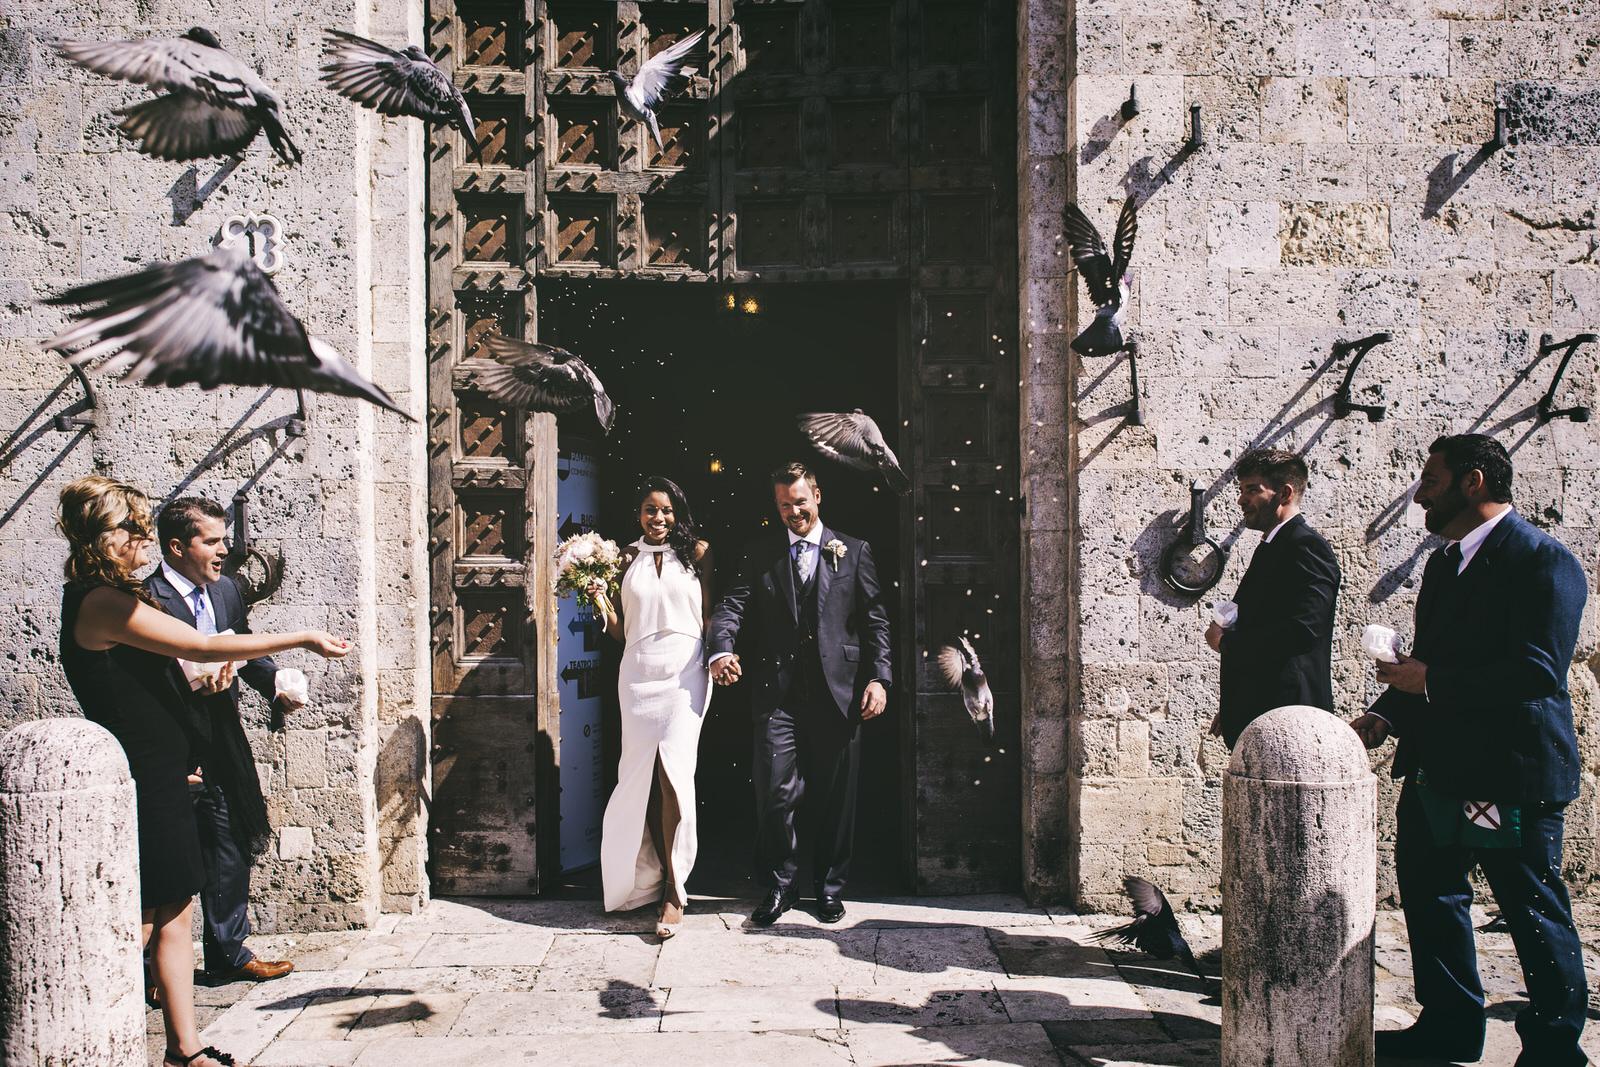 wedding photographer in italy-venice-tuscany-florence-amalfi coast-como lake-villa del balbianello-siena-amalfi-ravello-belmond-villa cimbrone16